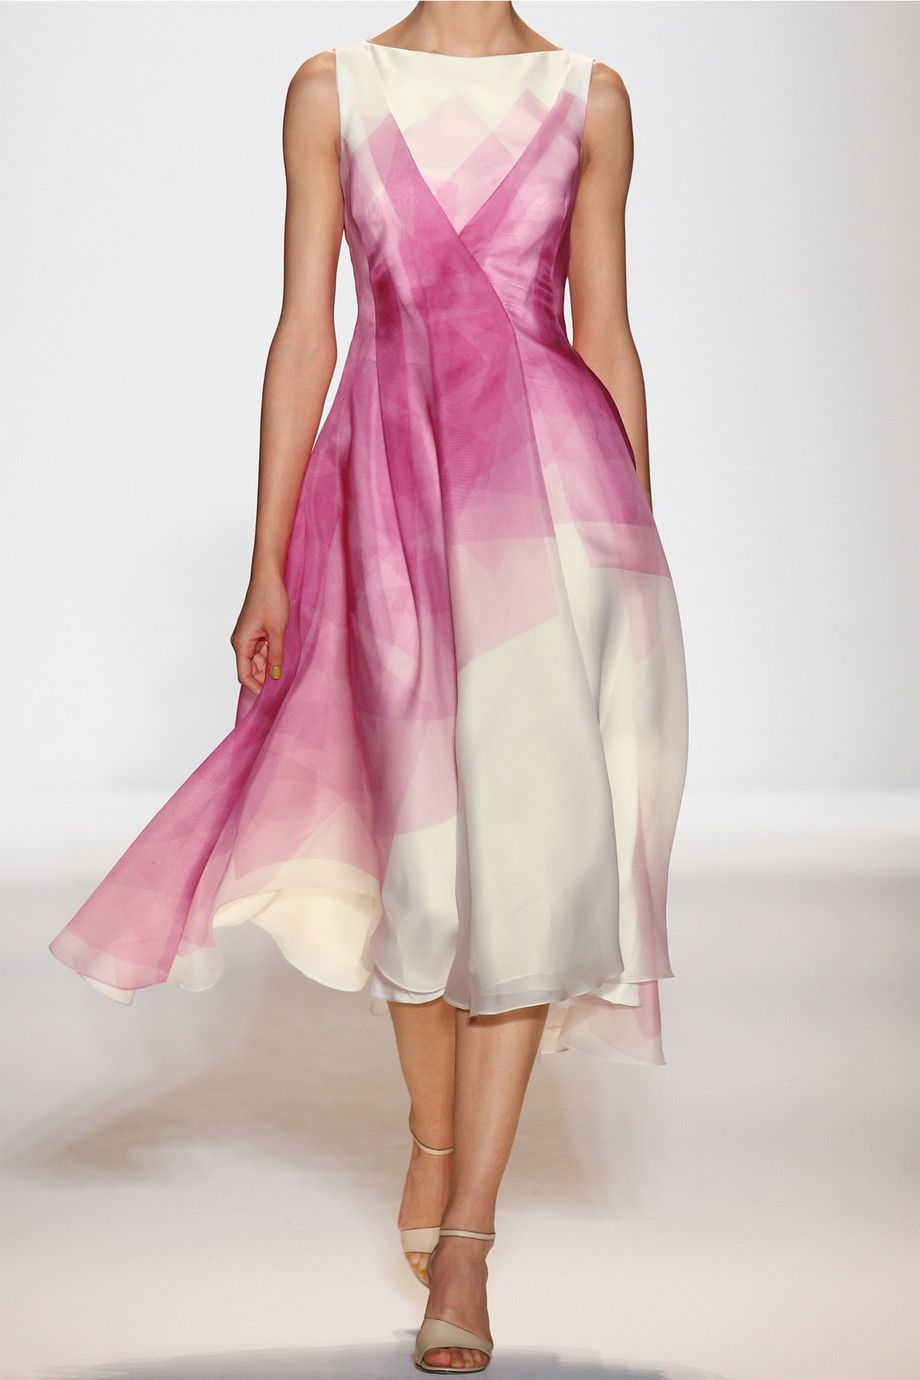 50394849bf90 Lela Rose | Printed silk-organza dress | NET-A-PORTER.COM - my dress to  wear to the Ballet. Isn't it beautiful?